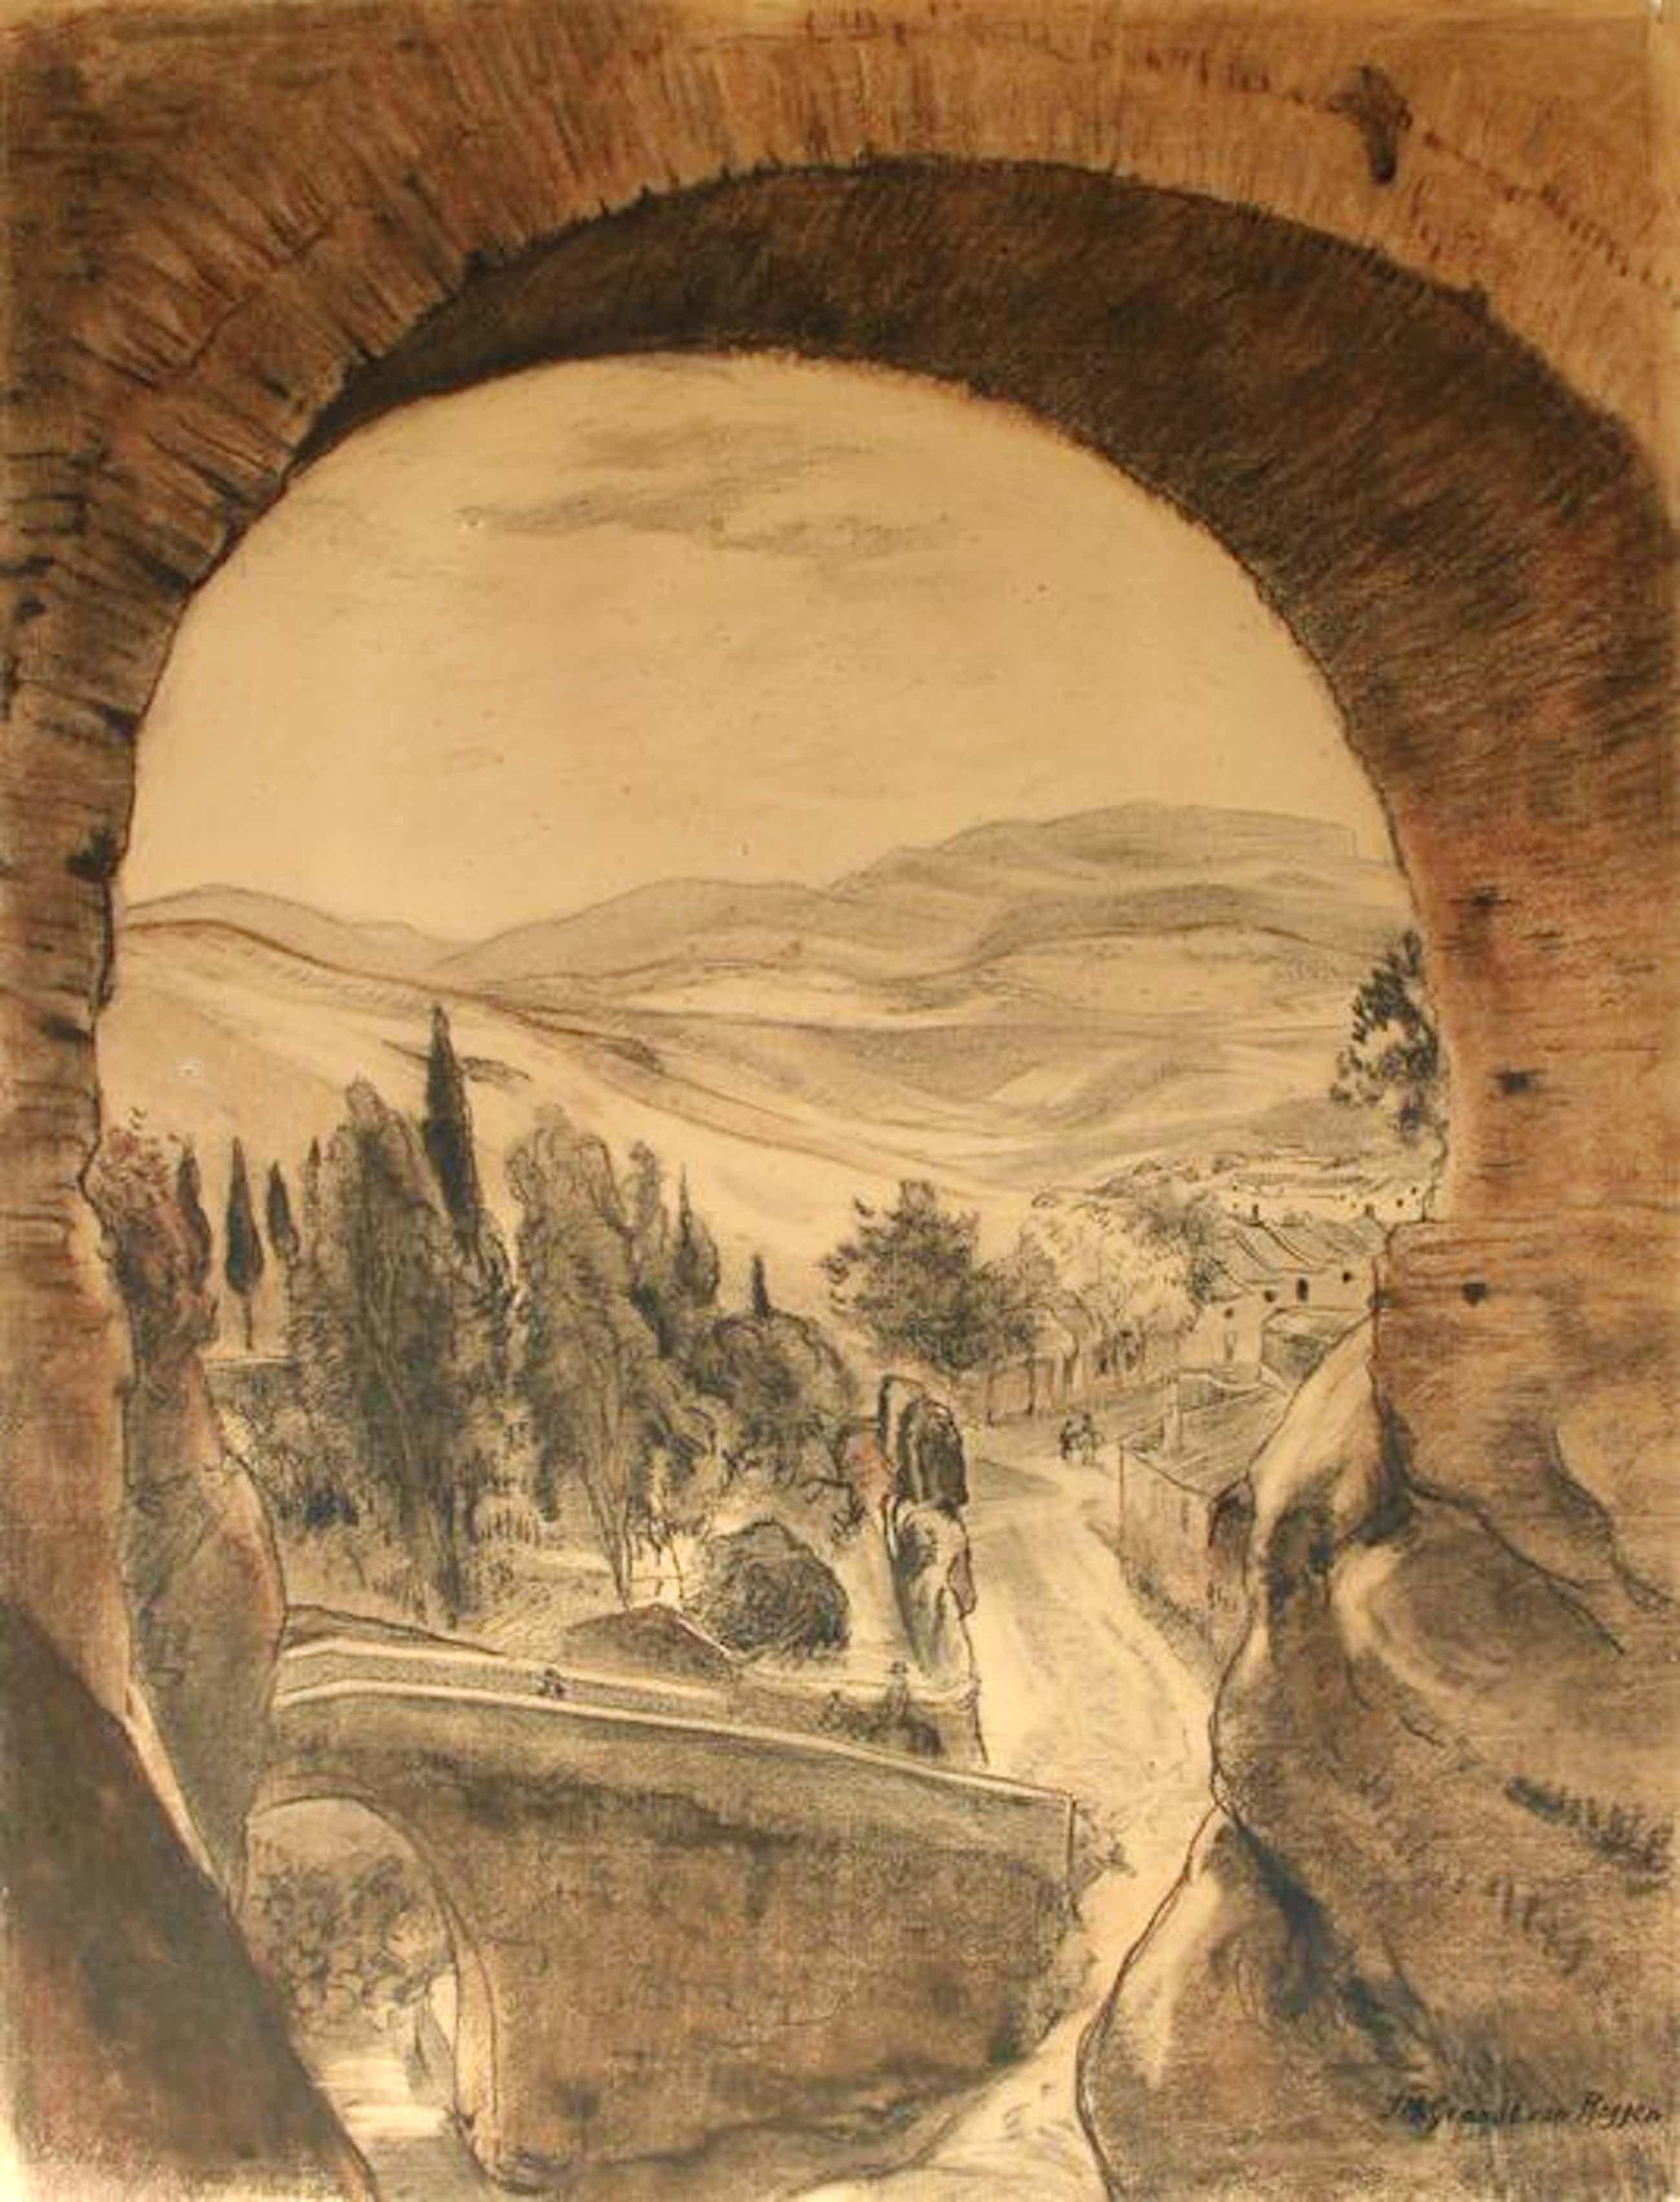 Johannes Graadt van Roggen - (1867-1959) - Puentes Romano y Arabe bij Ronda (Malaga, Andalusië) kopen? Bied vanaf 99!